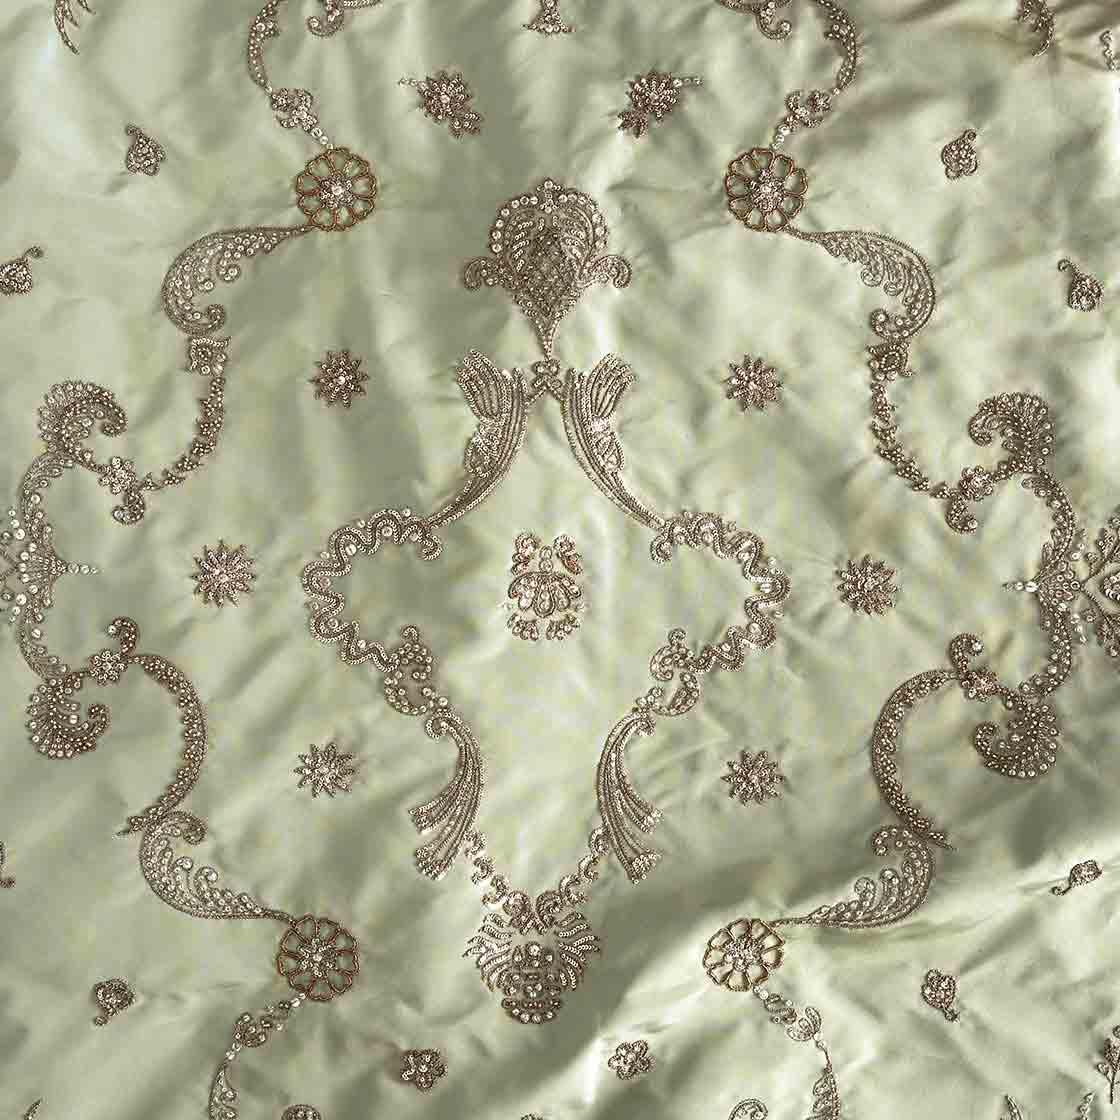 Tagore - On Silk Ash - Beaumont & Fletcher - Beaumont & Fletcher